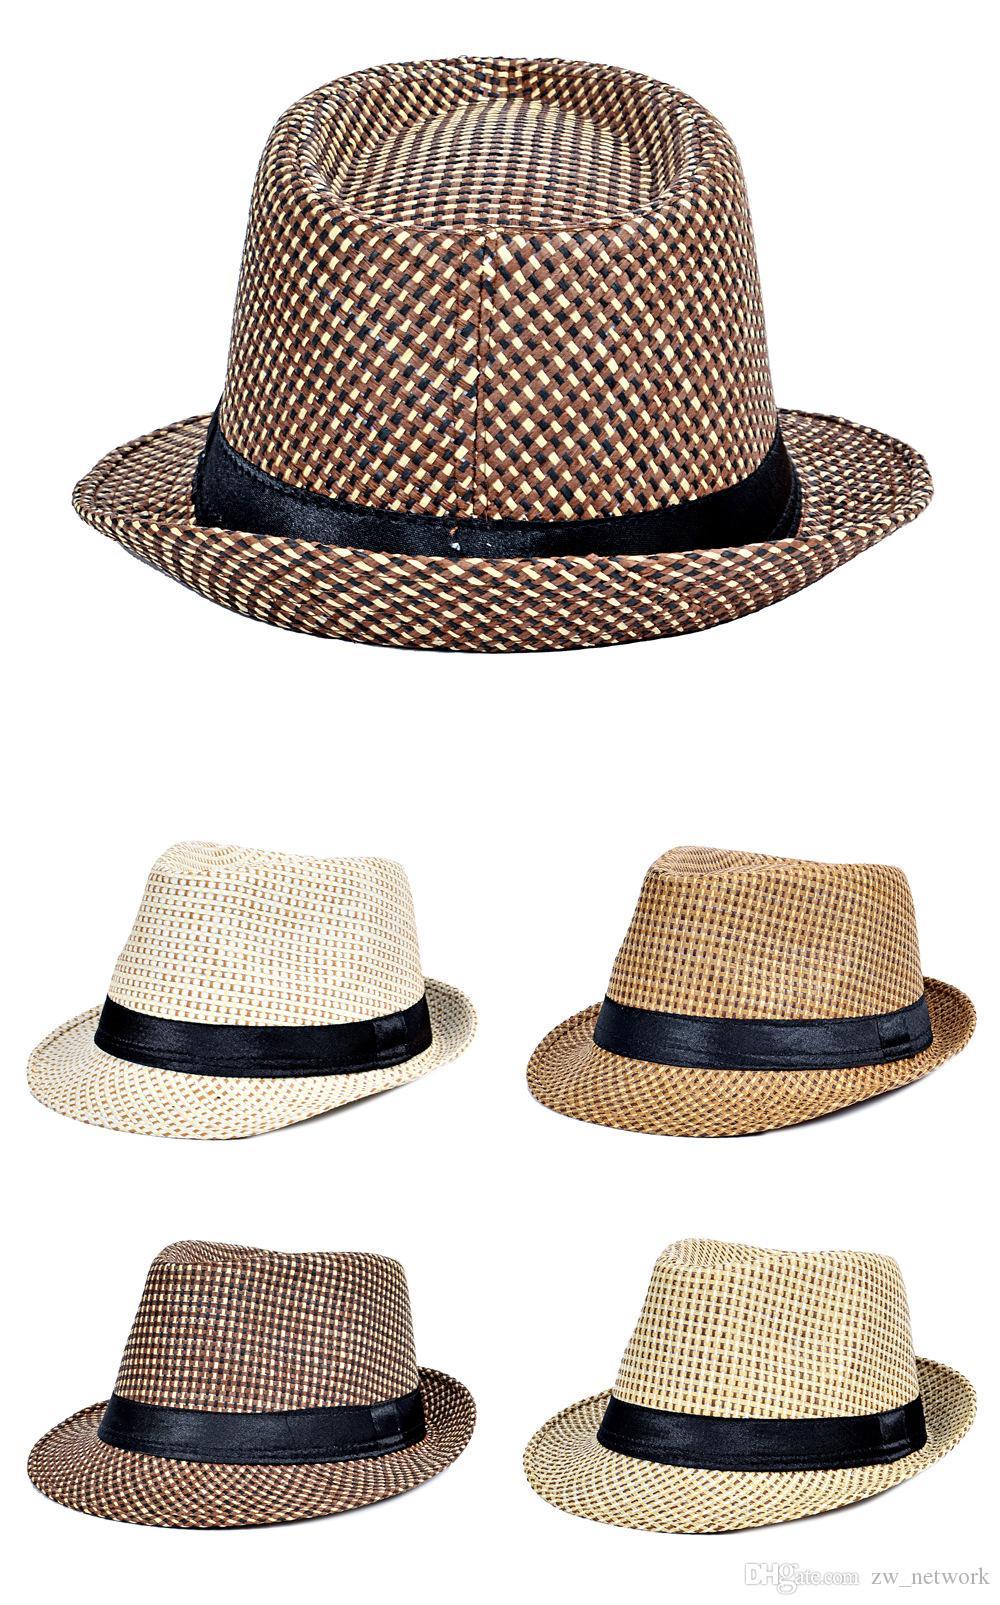 Compre Hot Fashion Jazz Sombreros De Paja Para Hombres Panamá Tejidos  Sombreros De Ala Ancha Sol Sombreros Hombres Cool Jazz Top Gorras A  2.85  Del ... a372a15abbd0